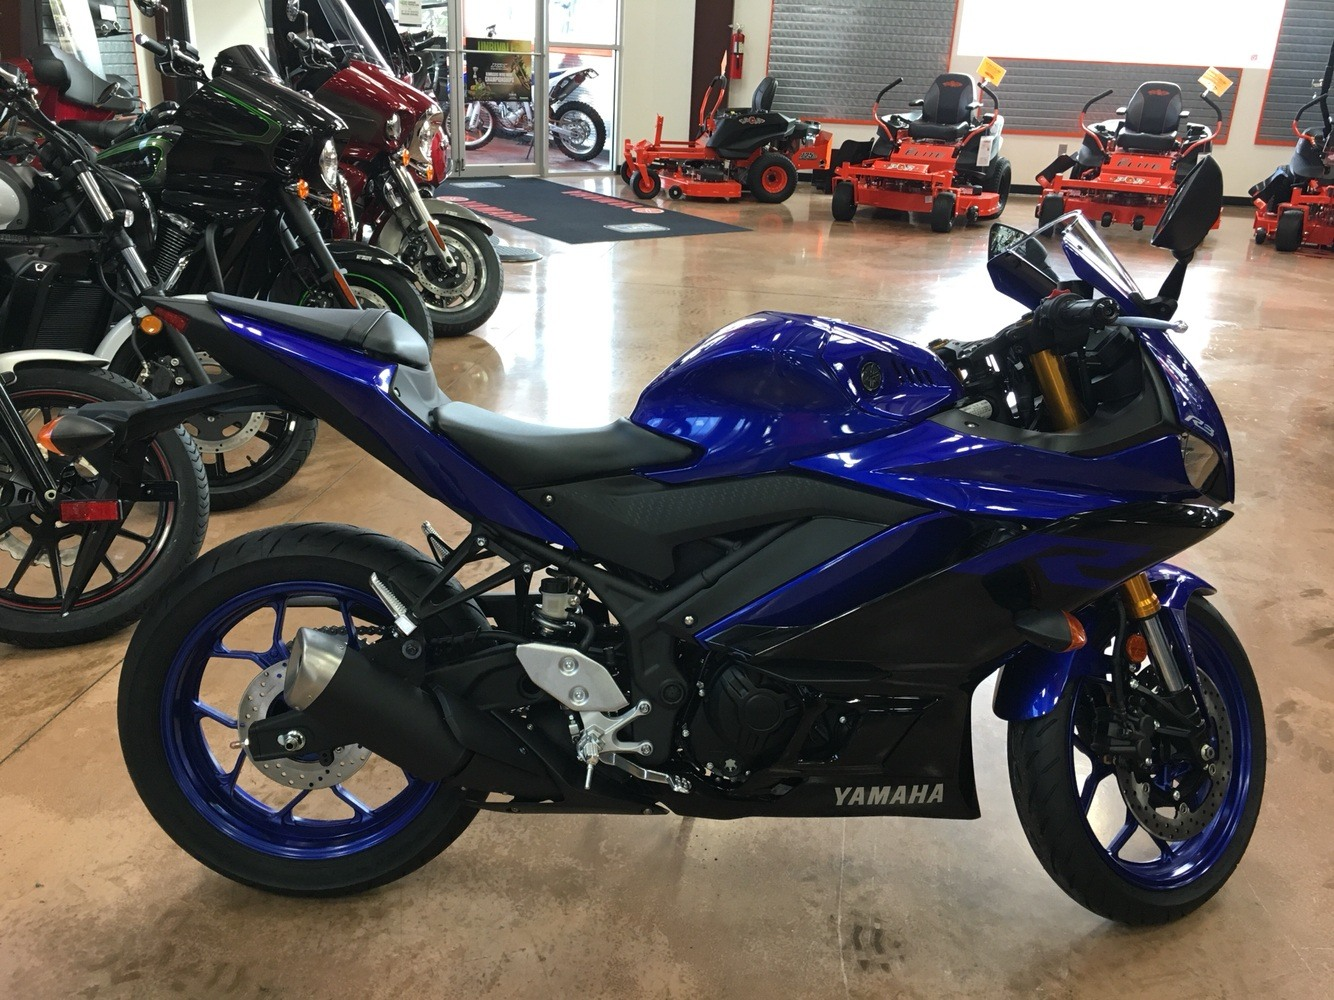 2019 Yamaha YZF-R3 3